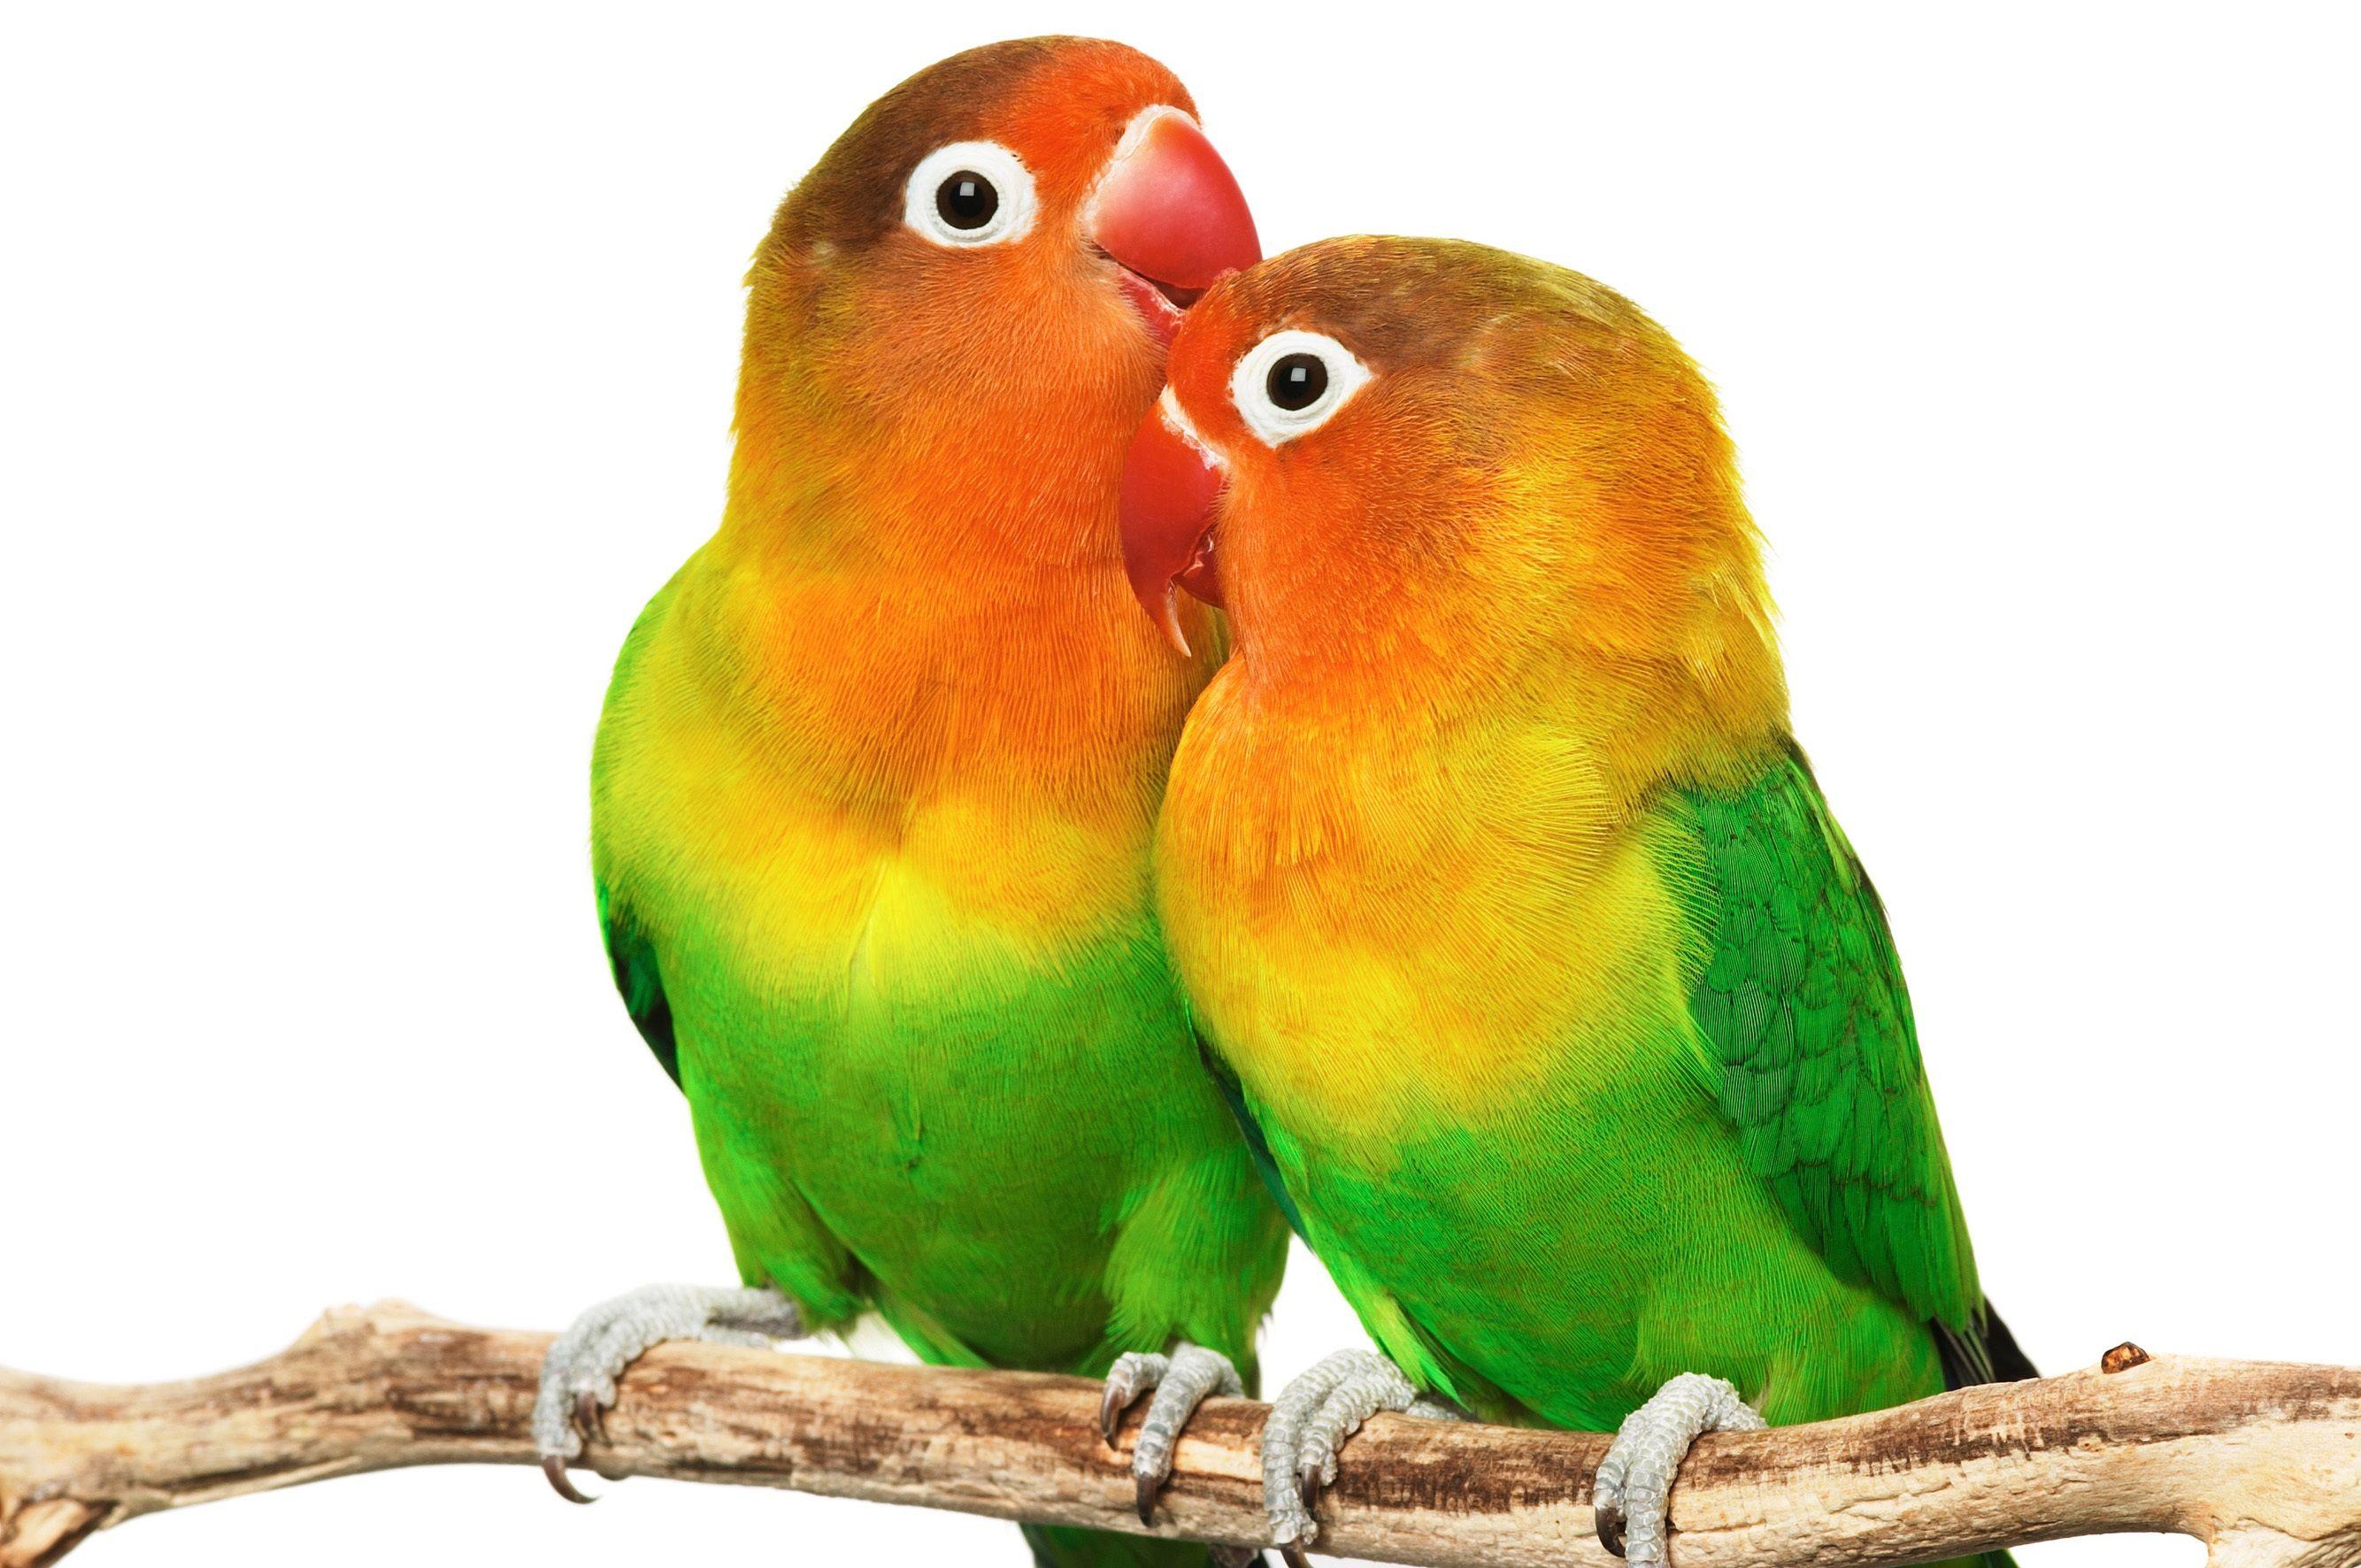 love birds hd images 3 #lovebirdshdimages #lovebirds #birds